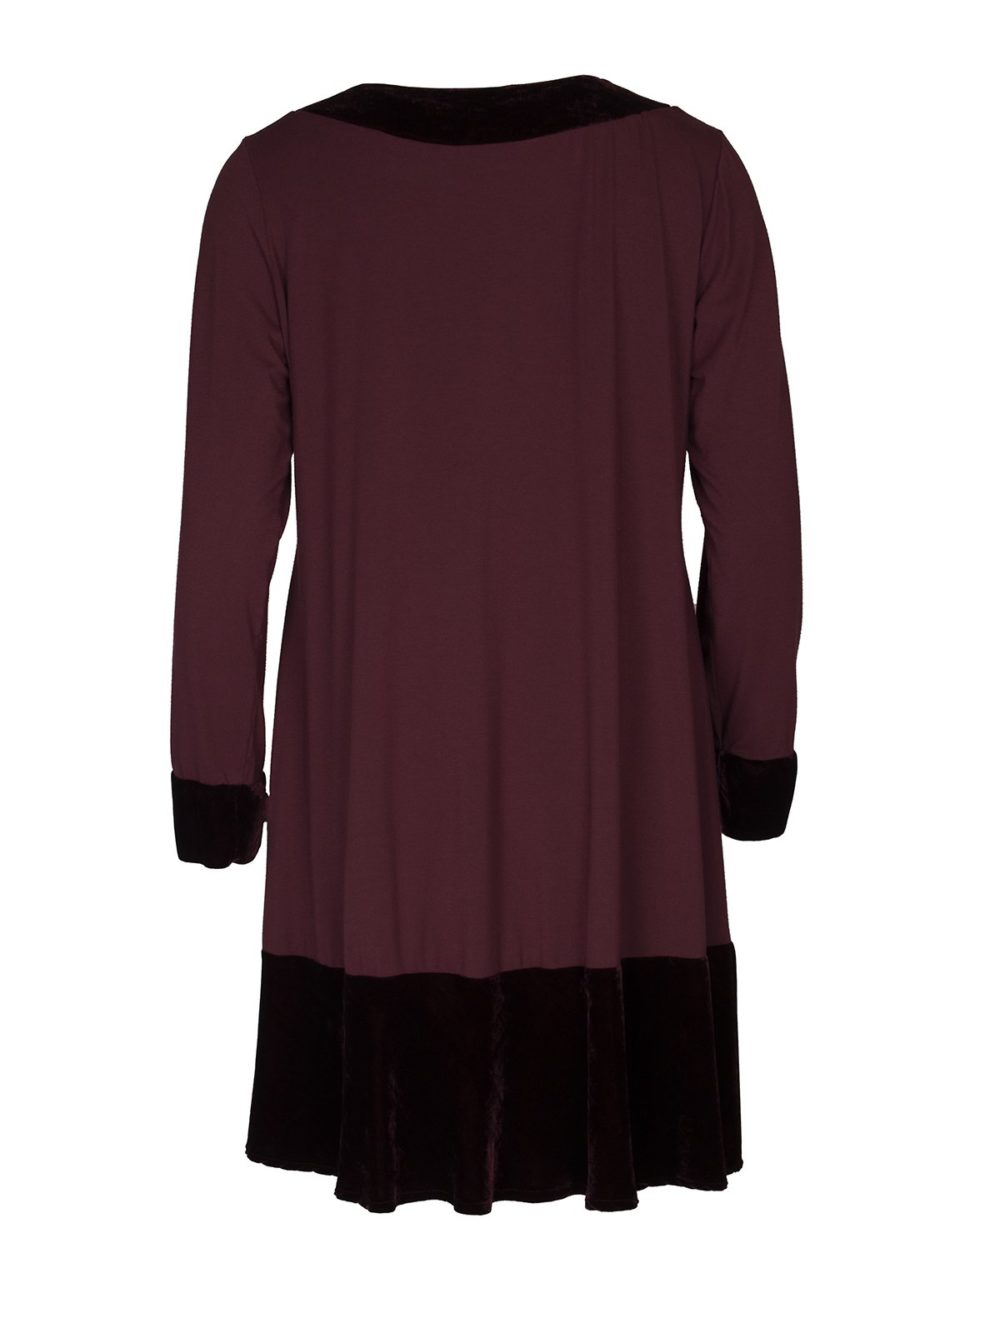 Velvet Trim Tunic 92v Out of Xile Katie Kerr Women's Clothing